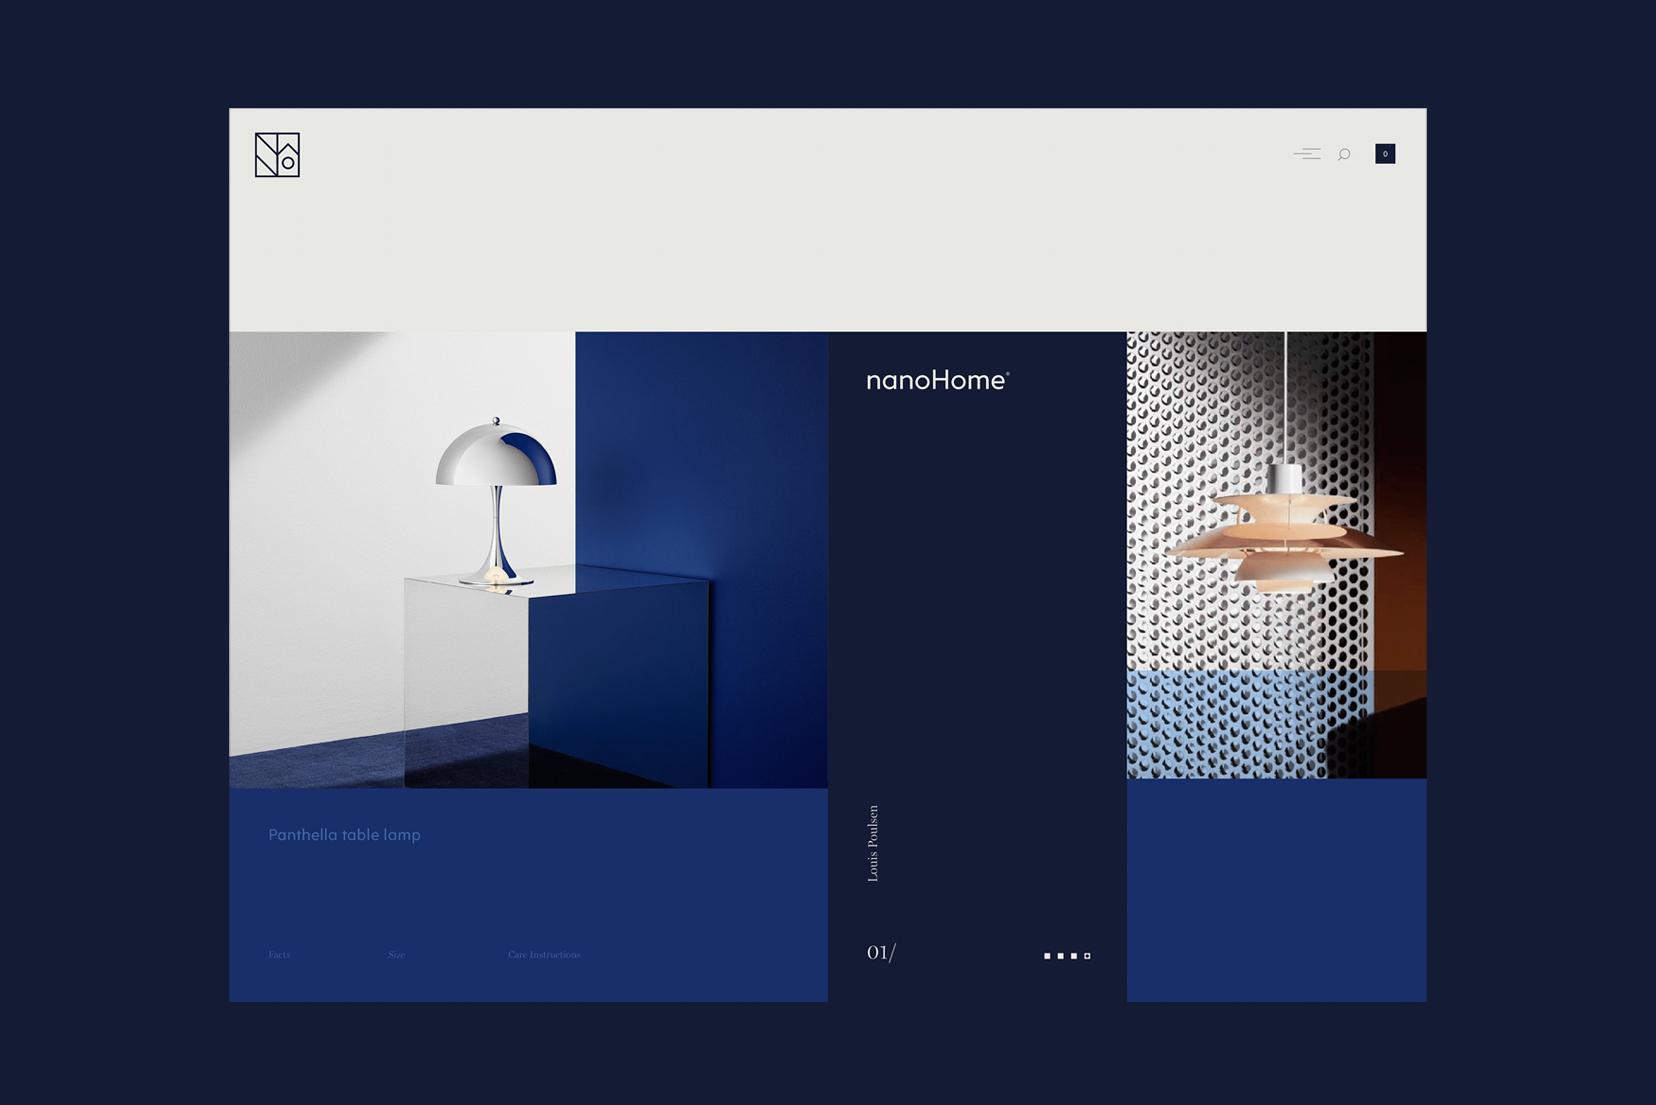 nanoHome webpage design